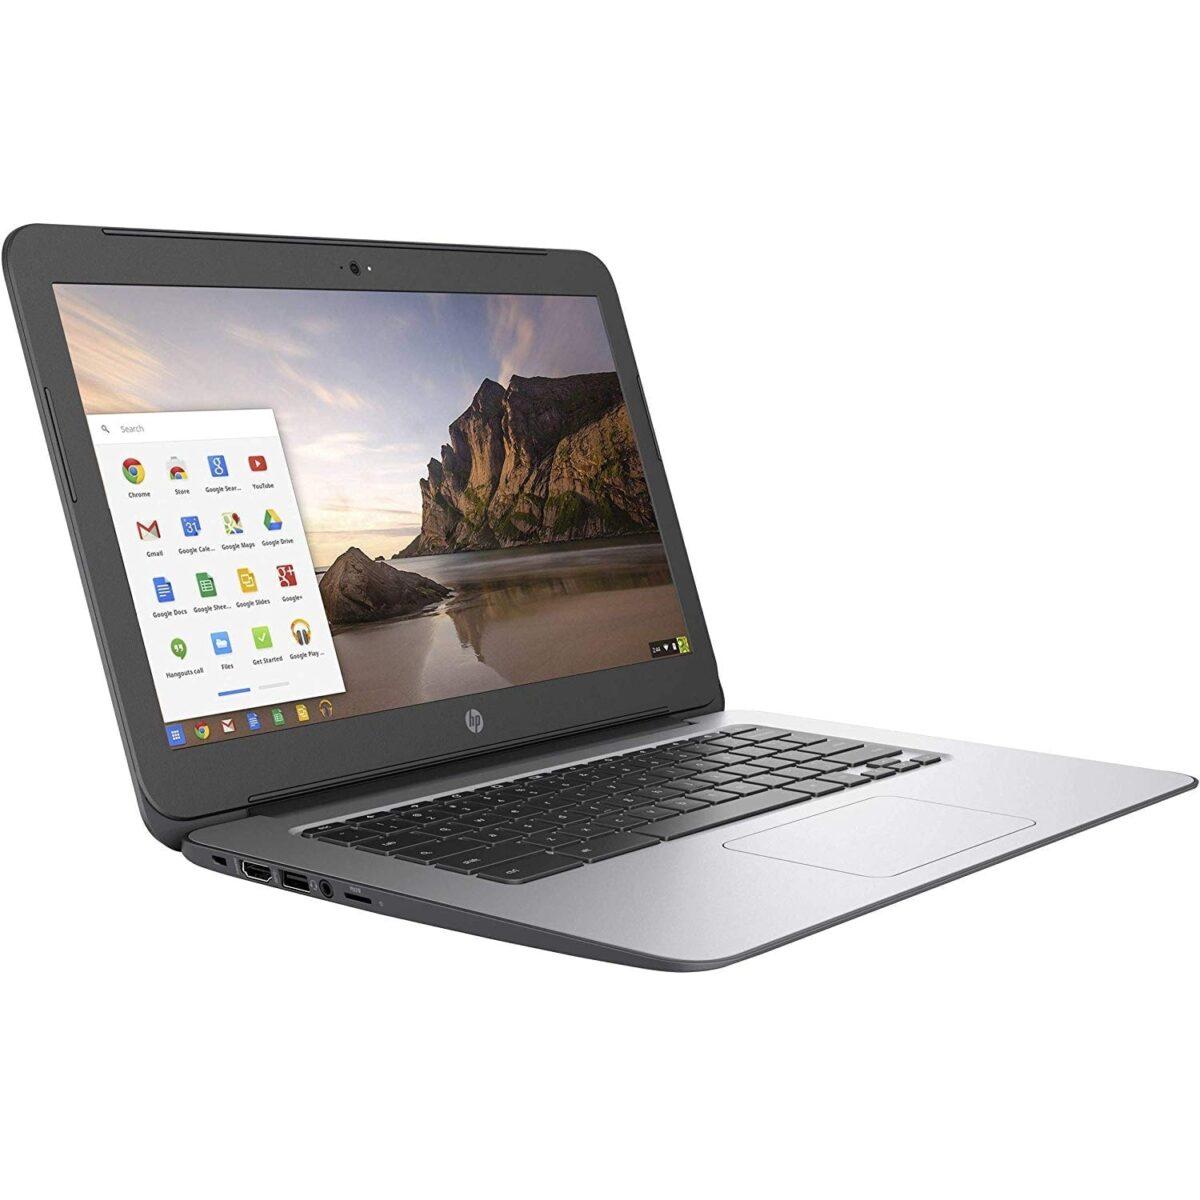 "HP Laptop Chromebook G4 Powerful 14"" 16GB 4GB Webcam HDMI Refurbished Black Sale"